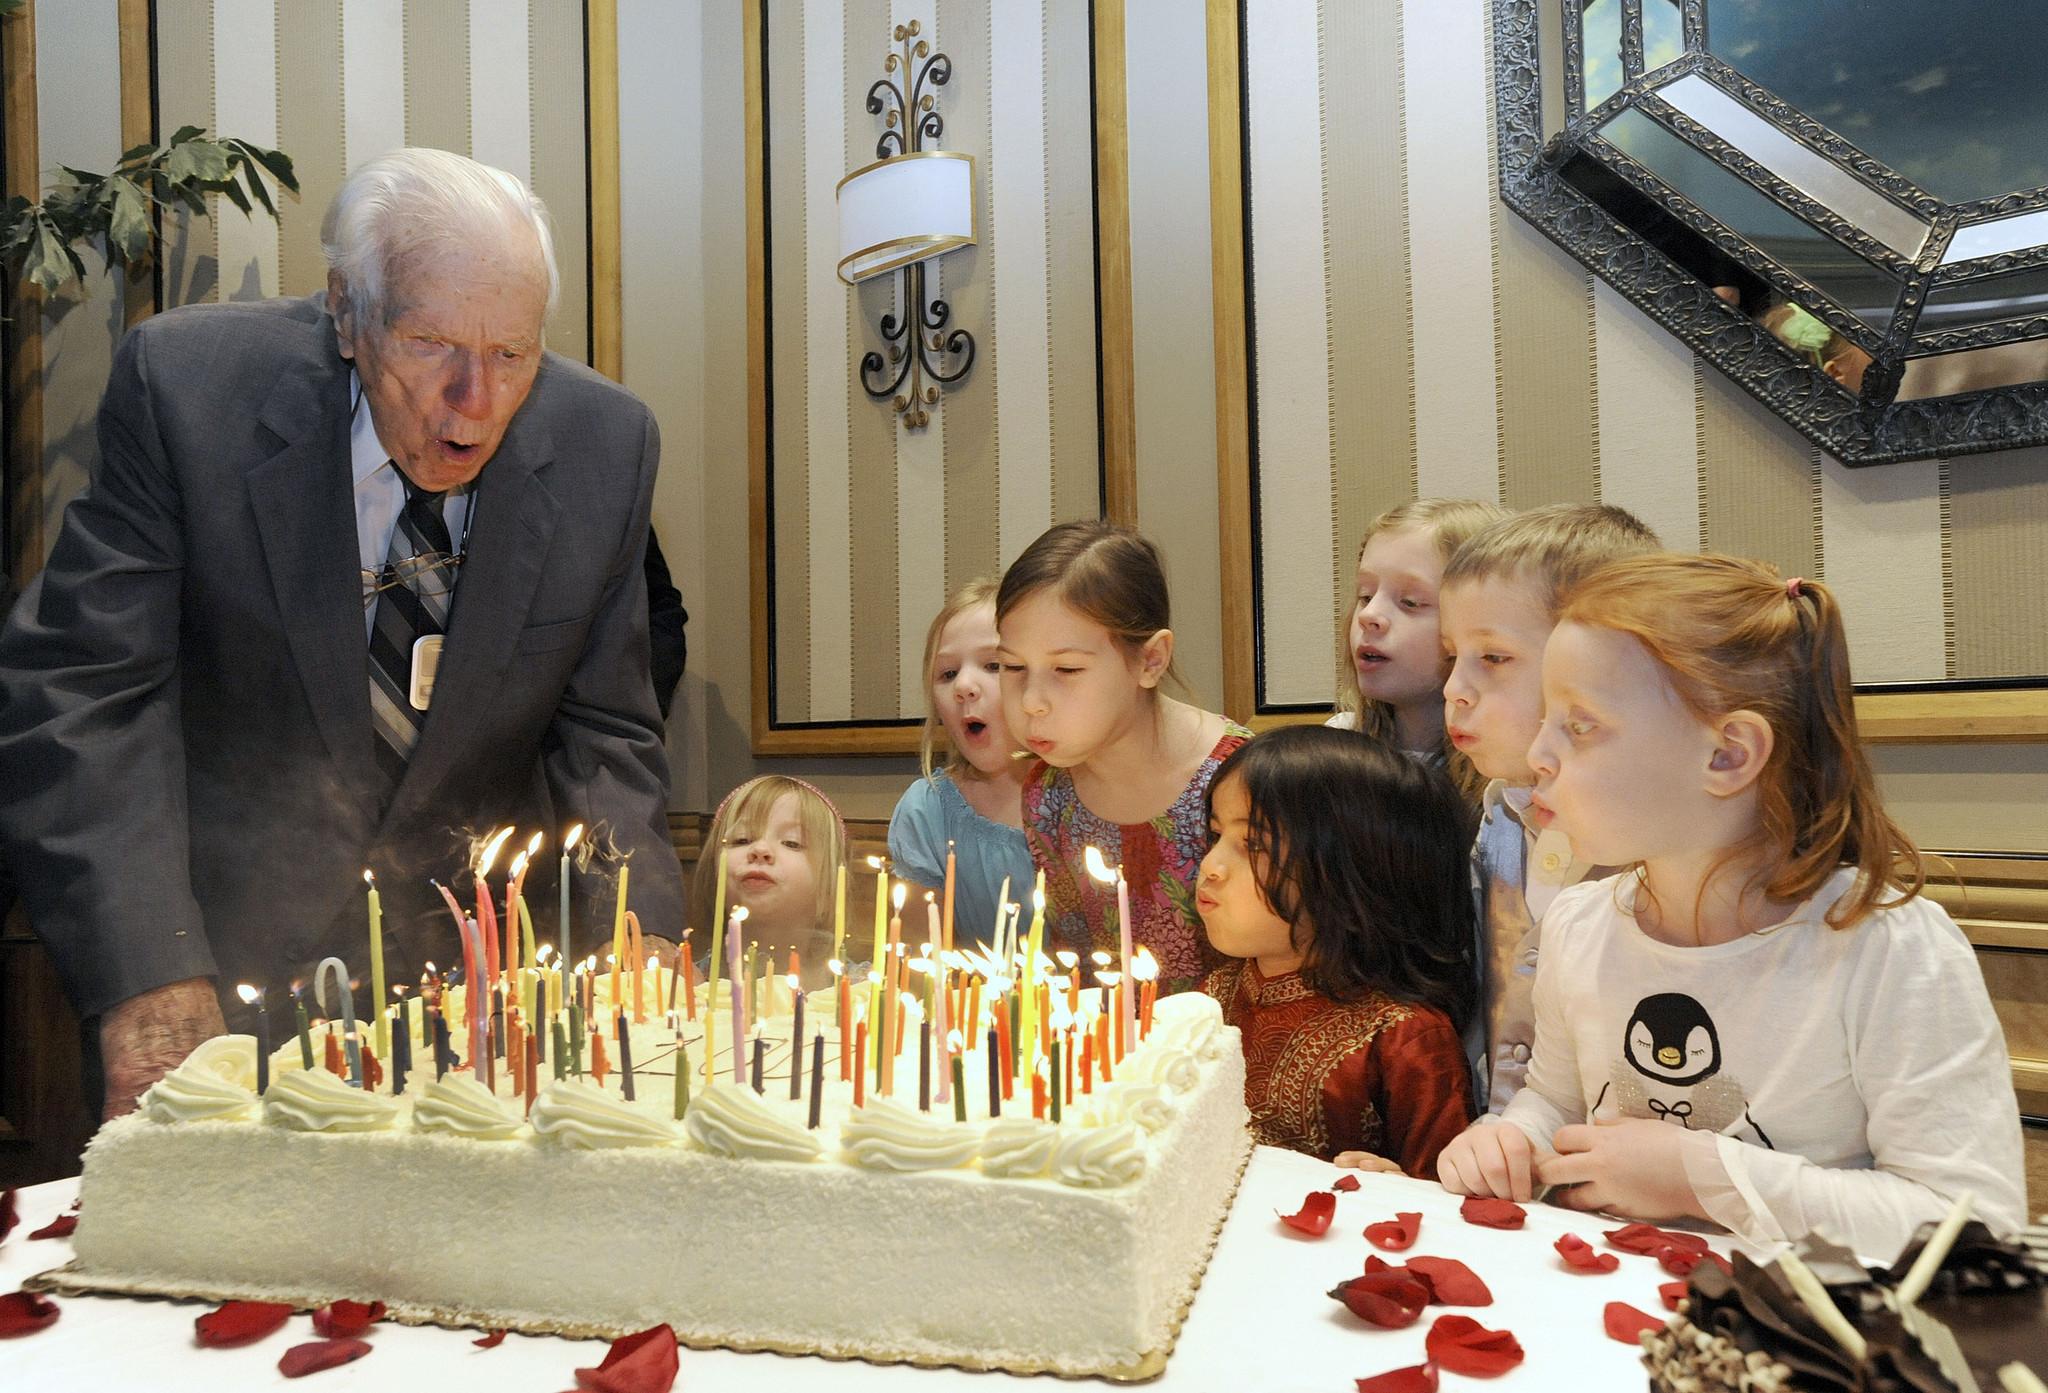 Captain John Slaughter Celebrates His 100th Birthday